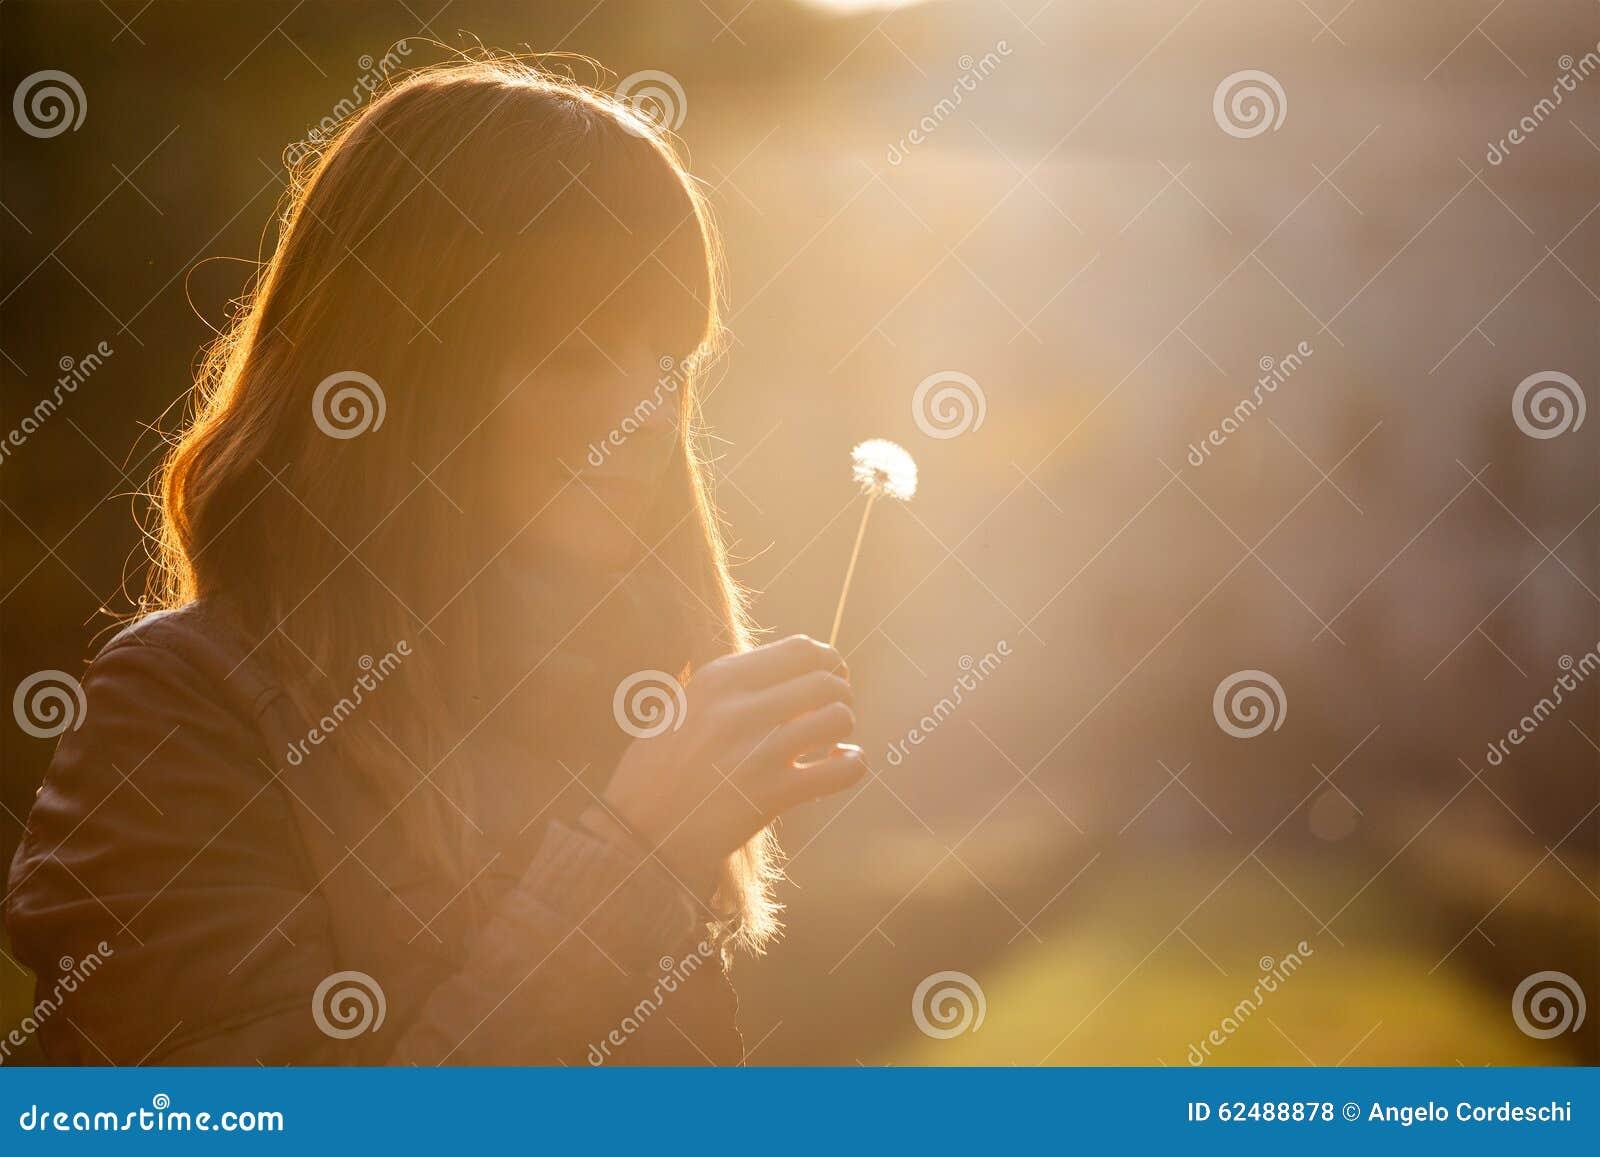 Gevoelig en breekbaar meisje, zoete hoopvrouw en aard Romantische zonsondergang